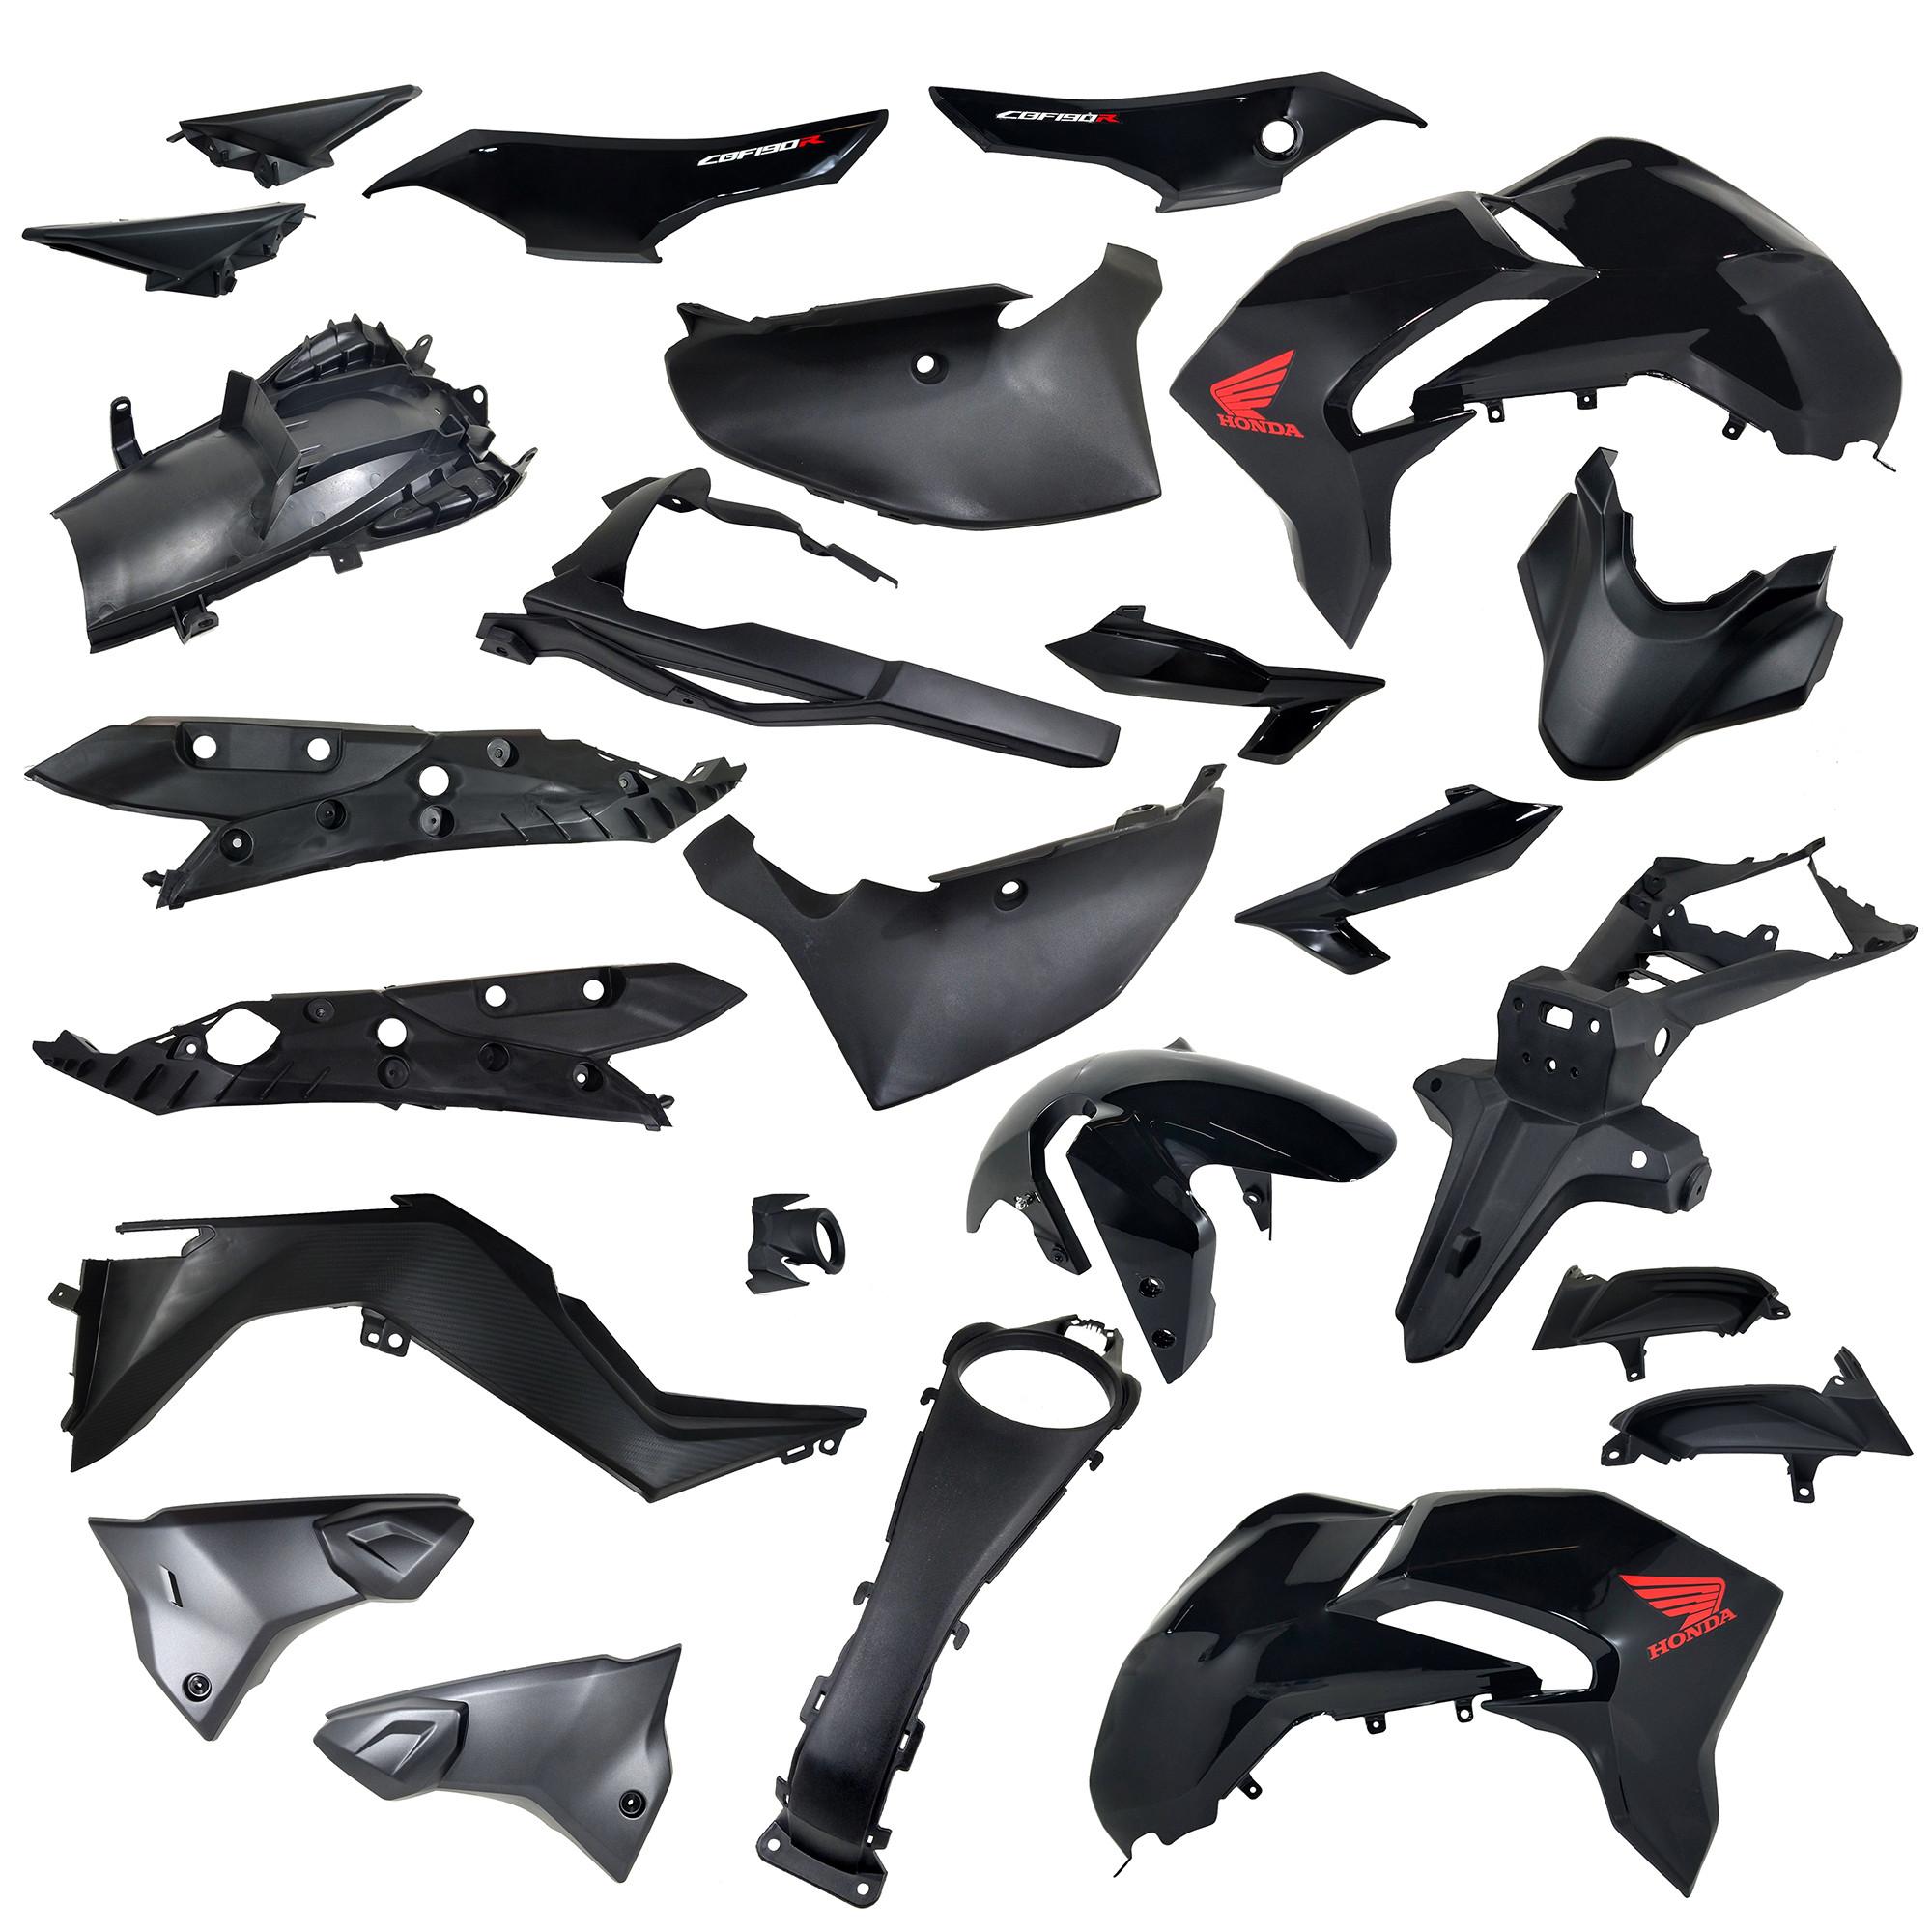 Kit Plasticos 24 Piezas Completo Honda Cb 190 R Negro Yoyo